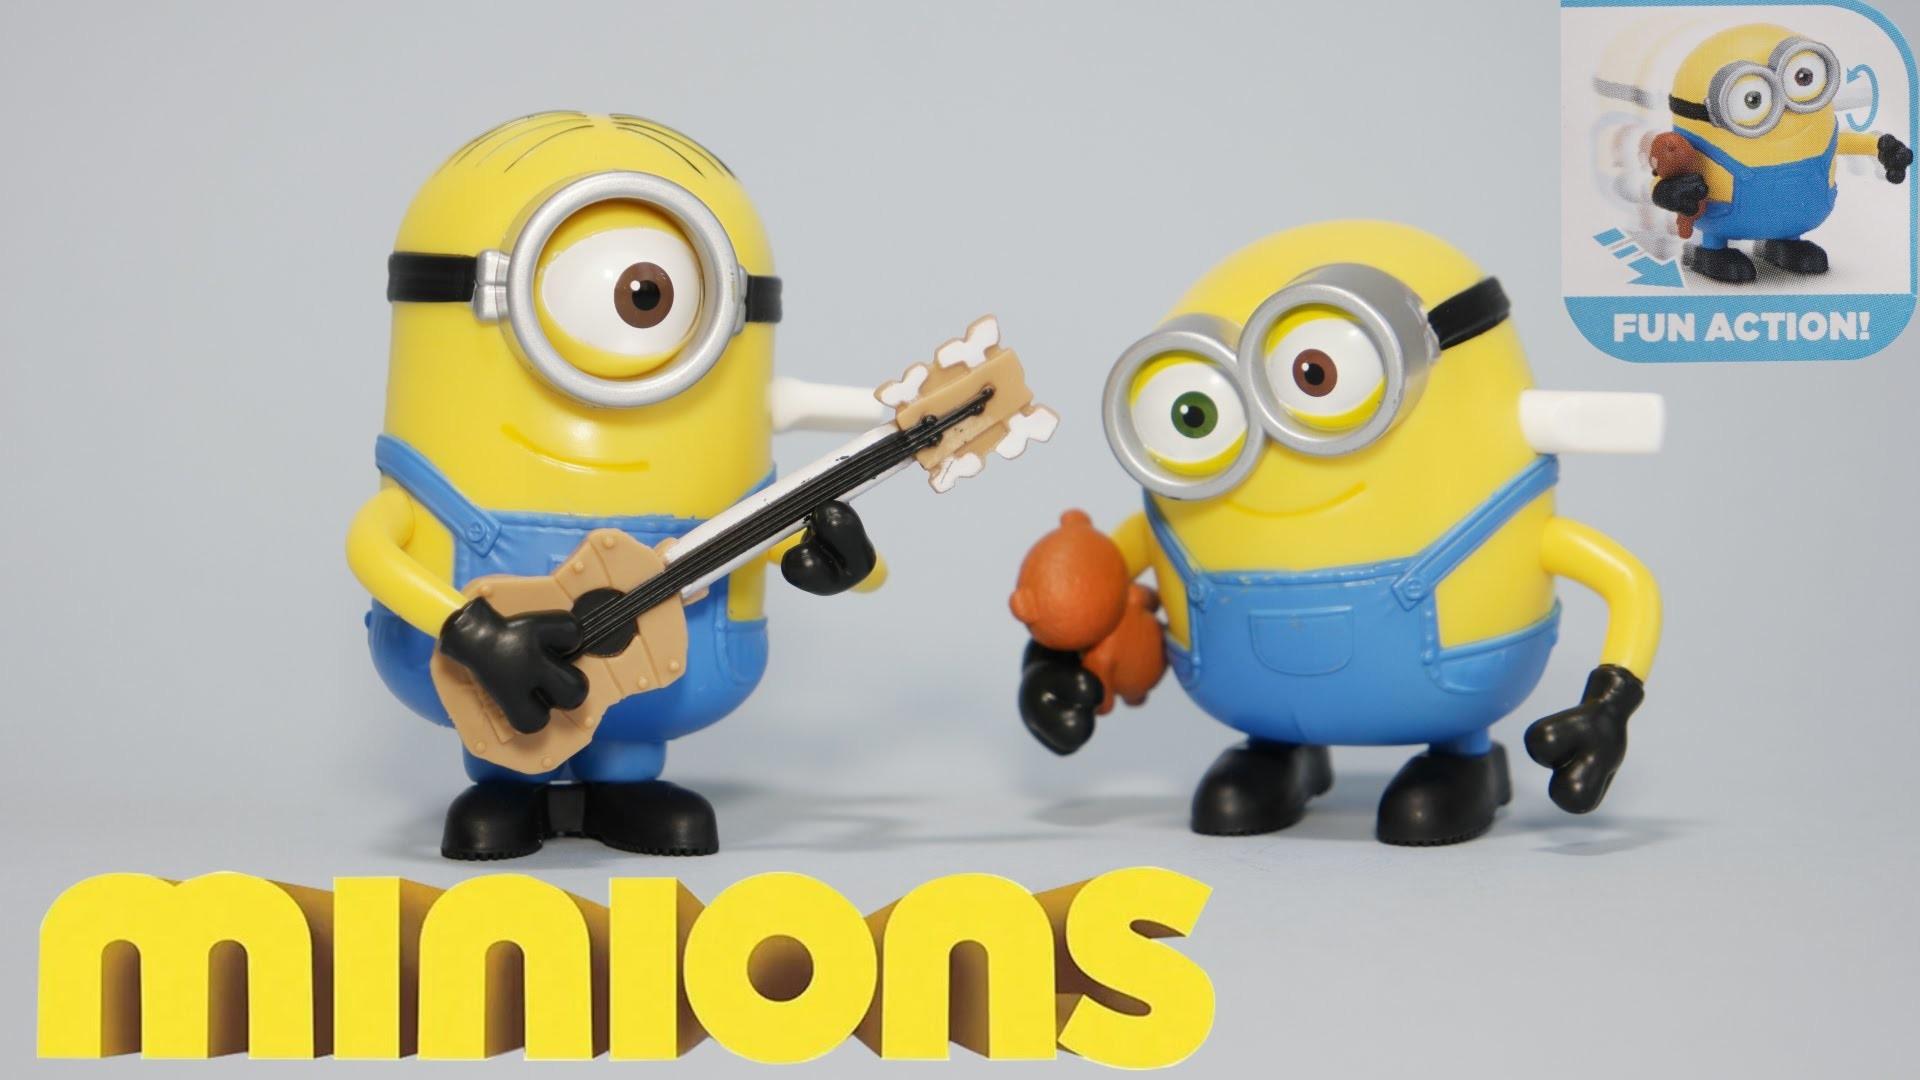 FUN ACTION MINIONS – BOPPING BOB & GUITAR STRUMMING STUART – New 2015 Movie  Exclusive Toys UHD 4K – YouTube